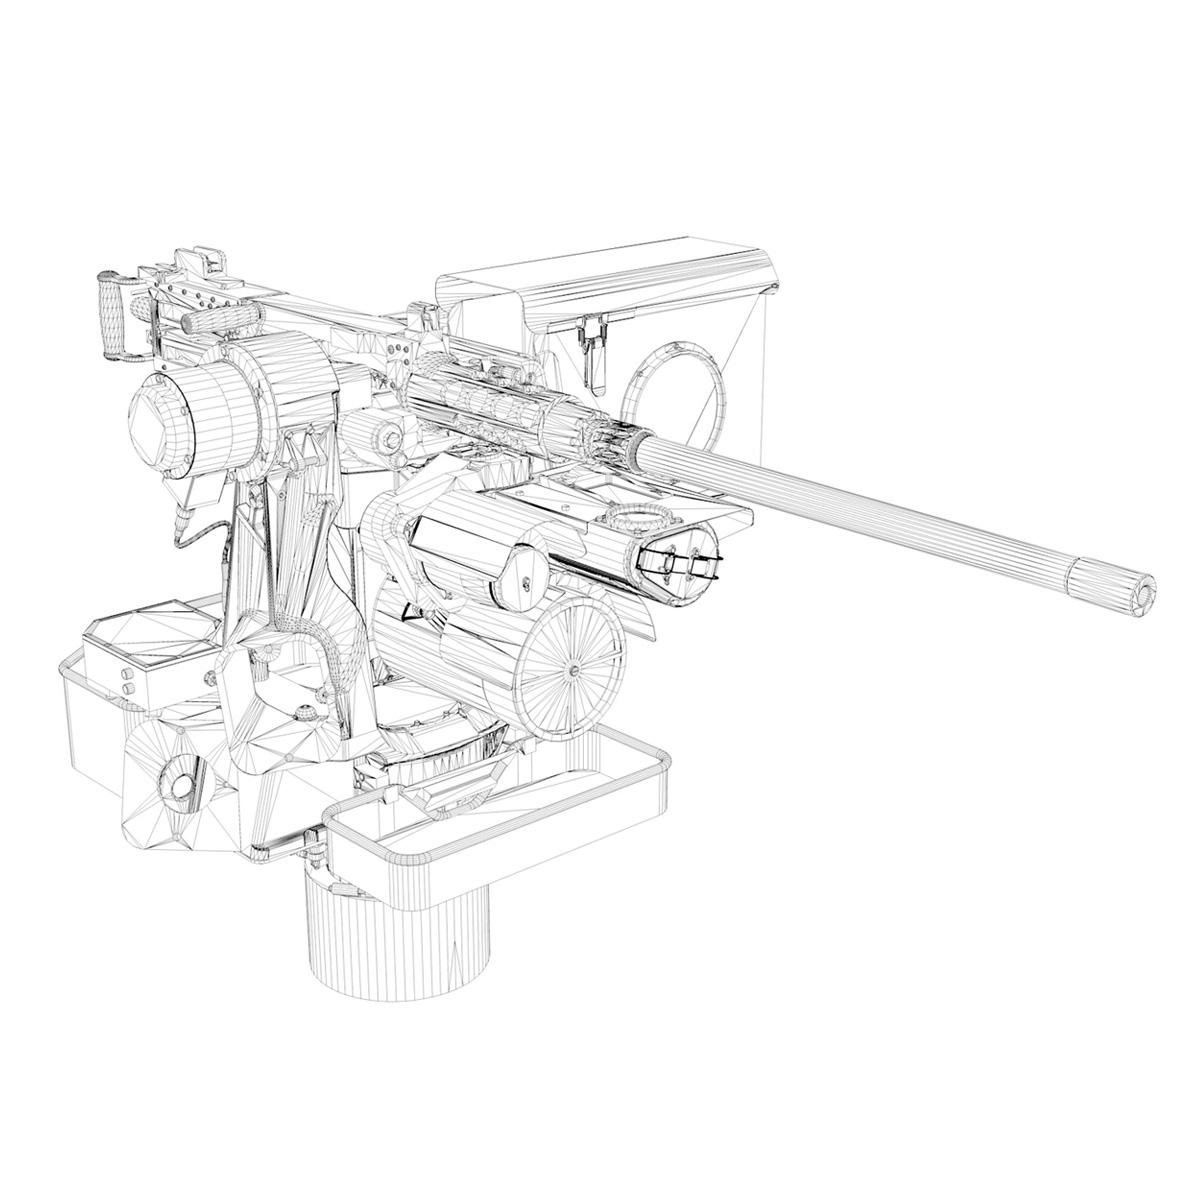 1200x1200 Kongsberg Protector M151 Rws 3d Model Guns Lws 3ds C4d Lwo Lws Lw